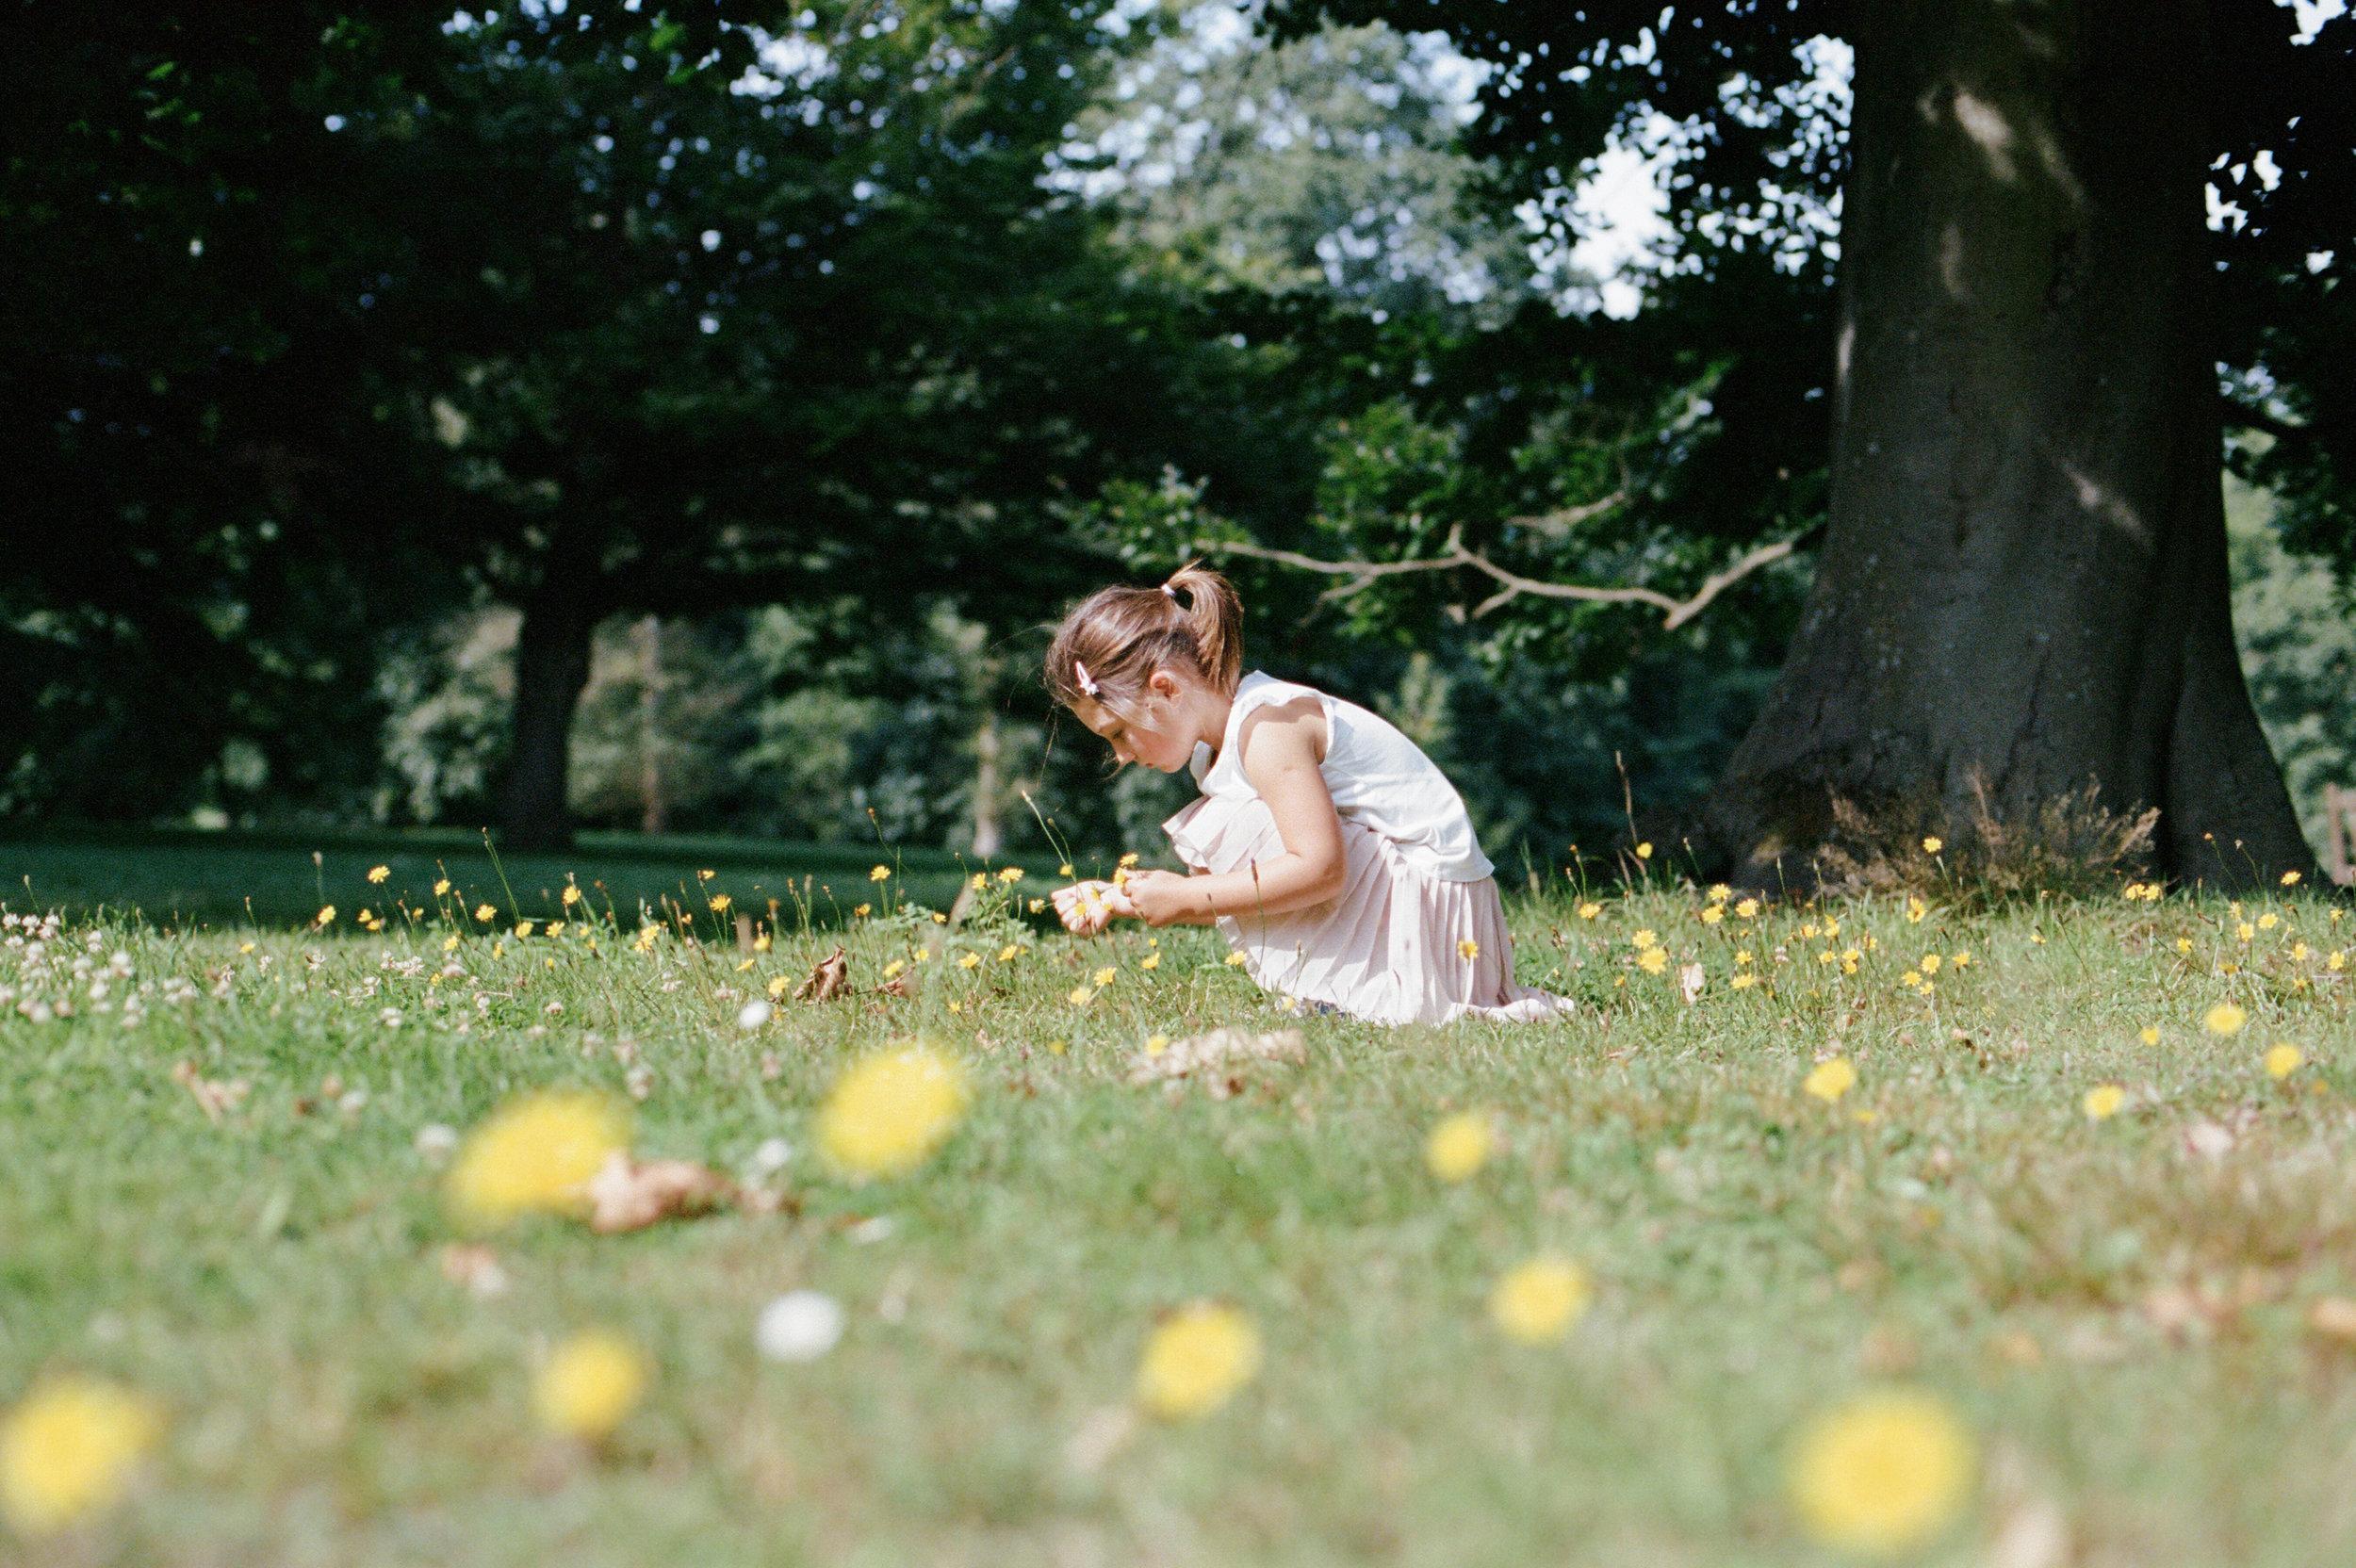 Nicola_London_Family_Photographer-84 copy.jpg